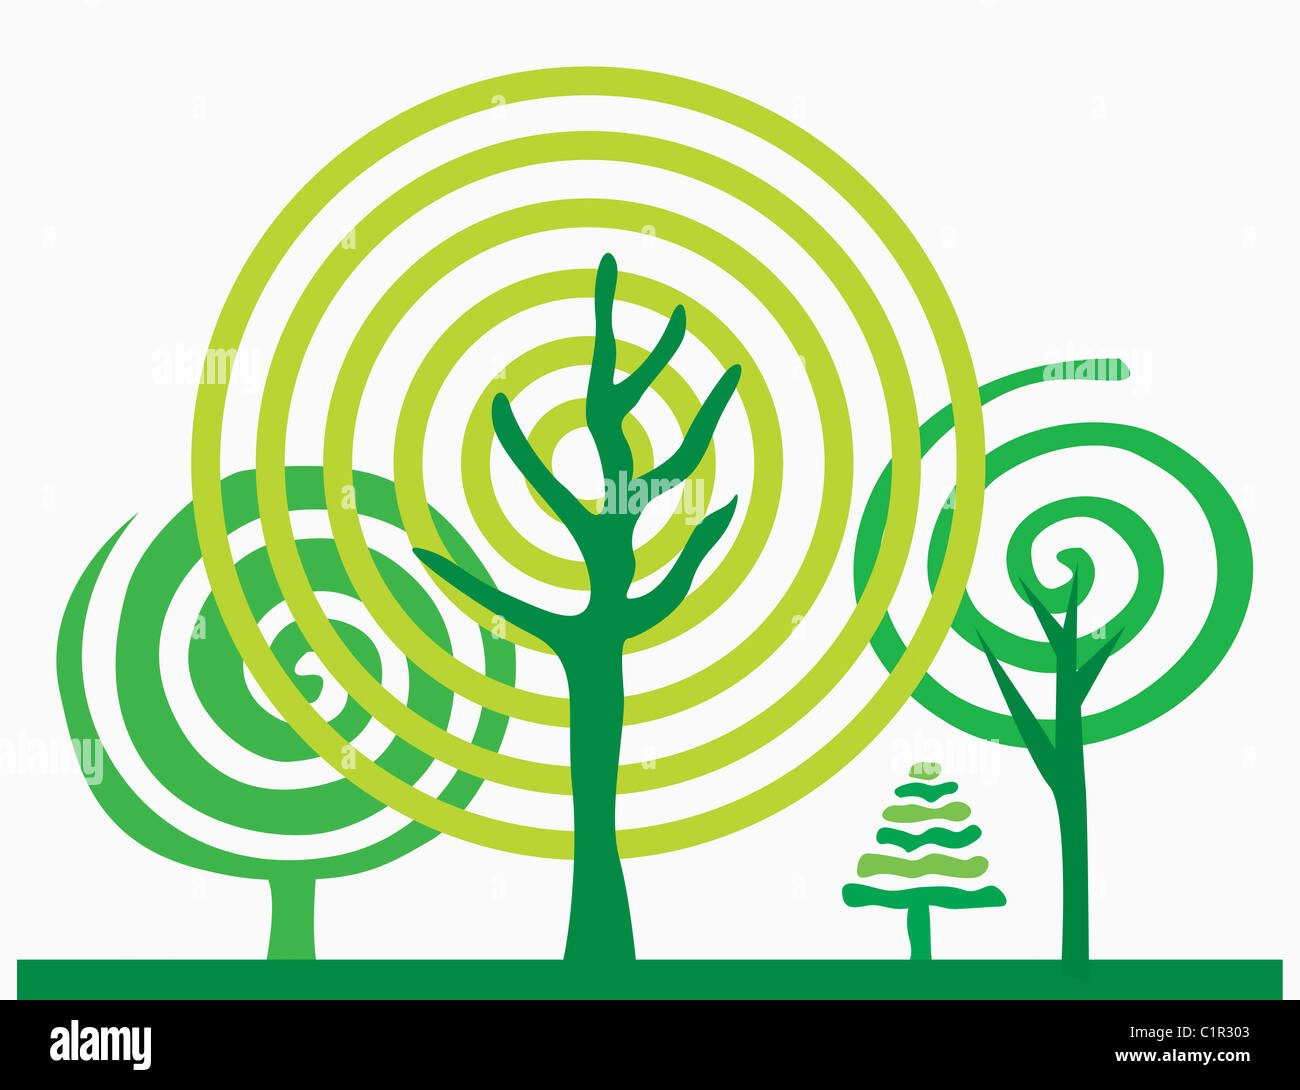 trees illustration - Stock Image